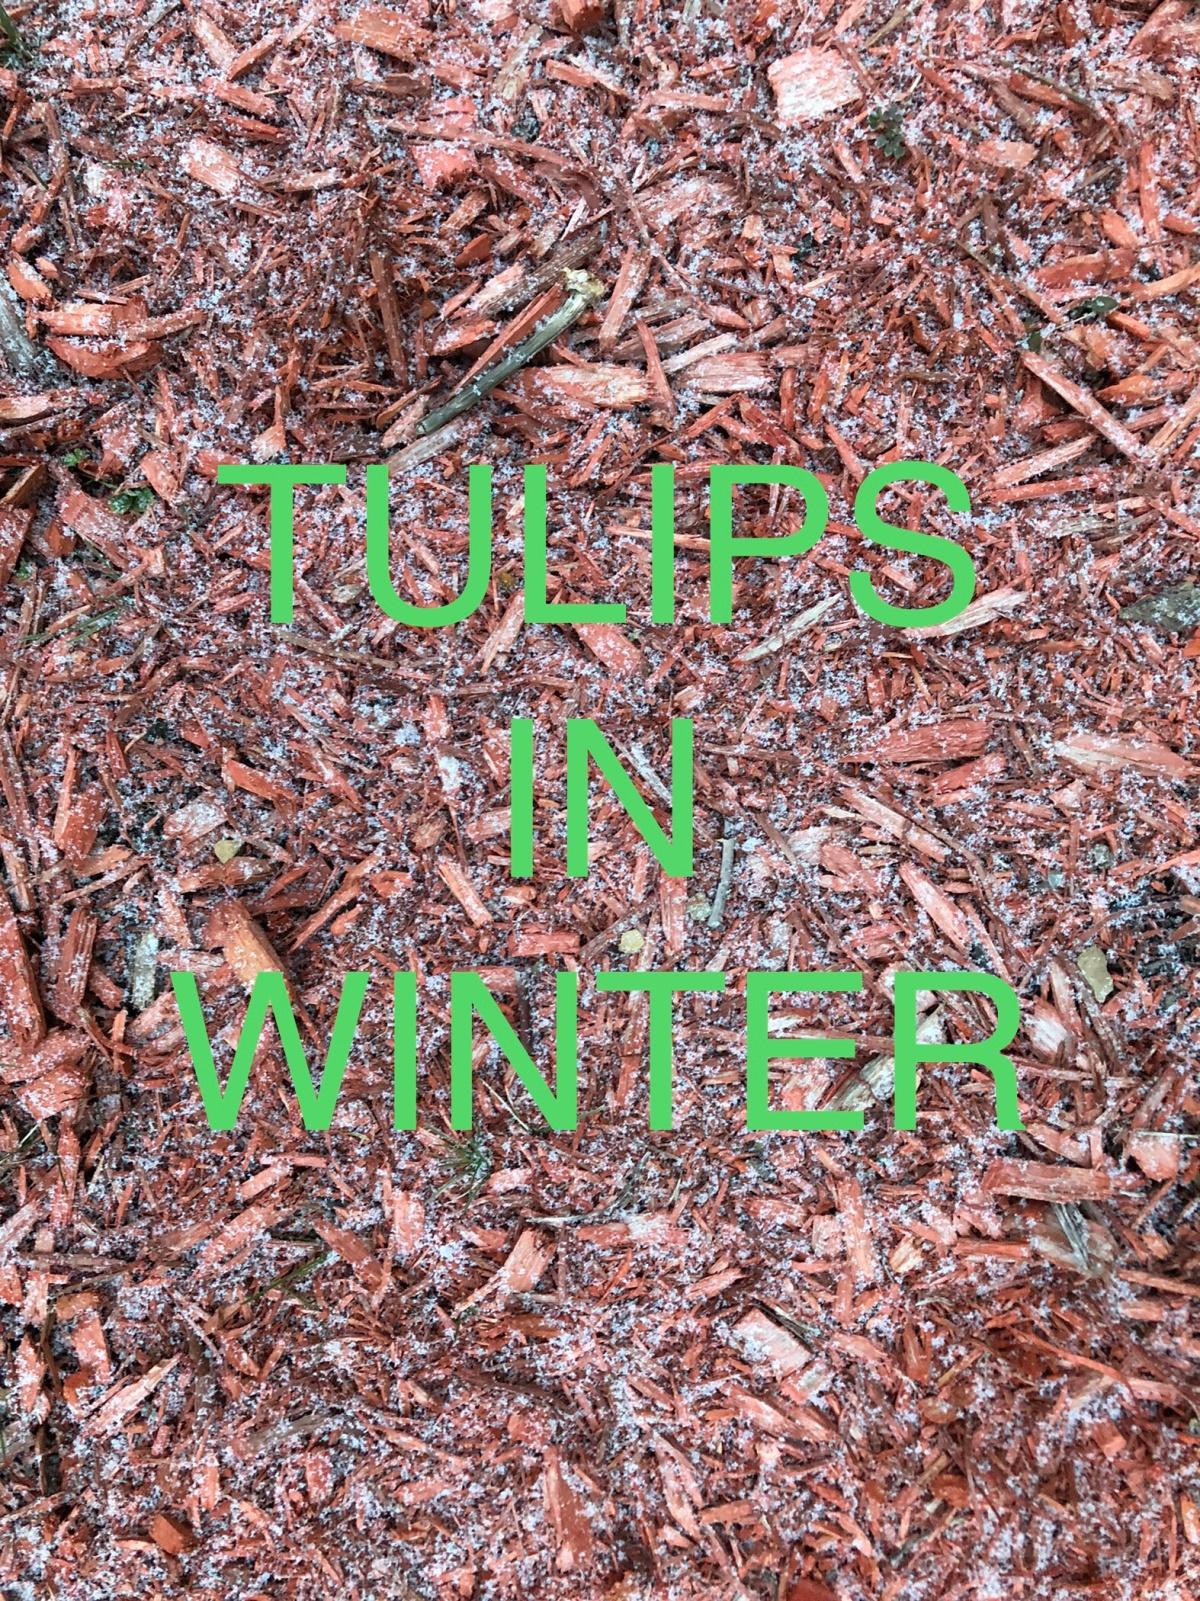 Growing Faith: 9 ~ Tulips inWinter